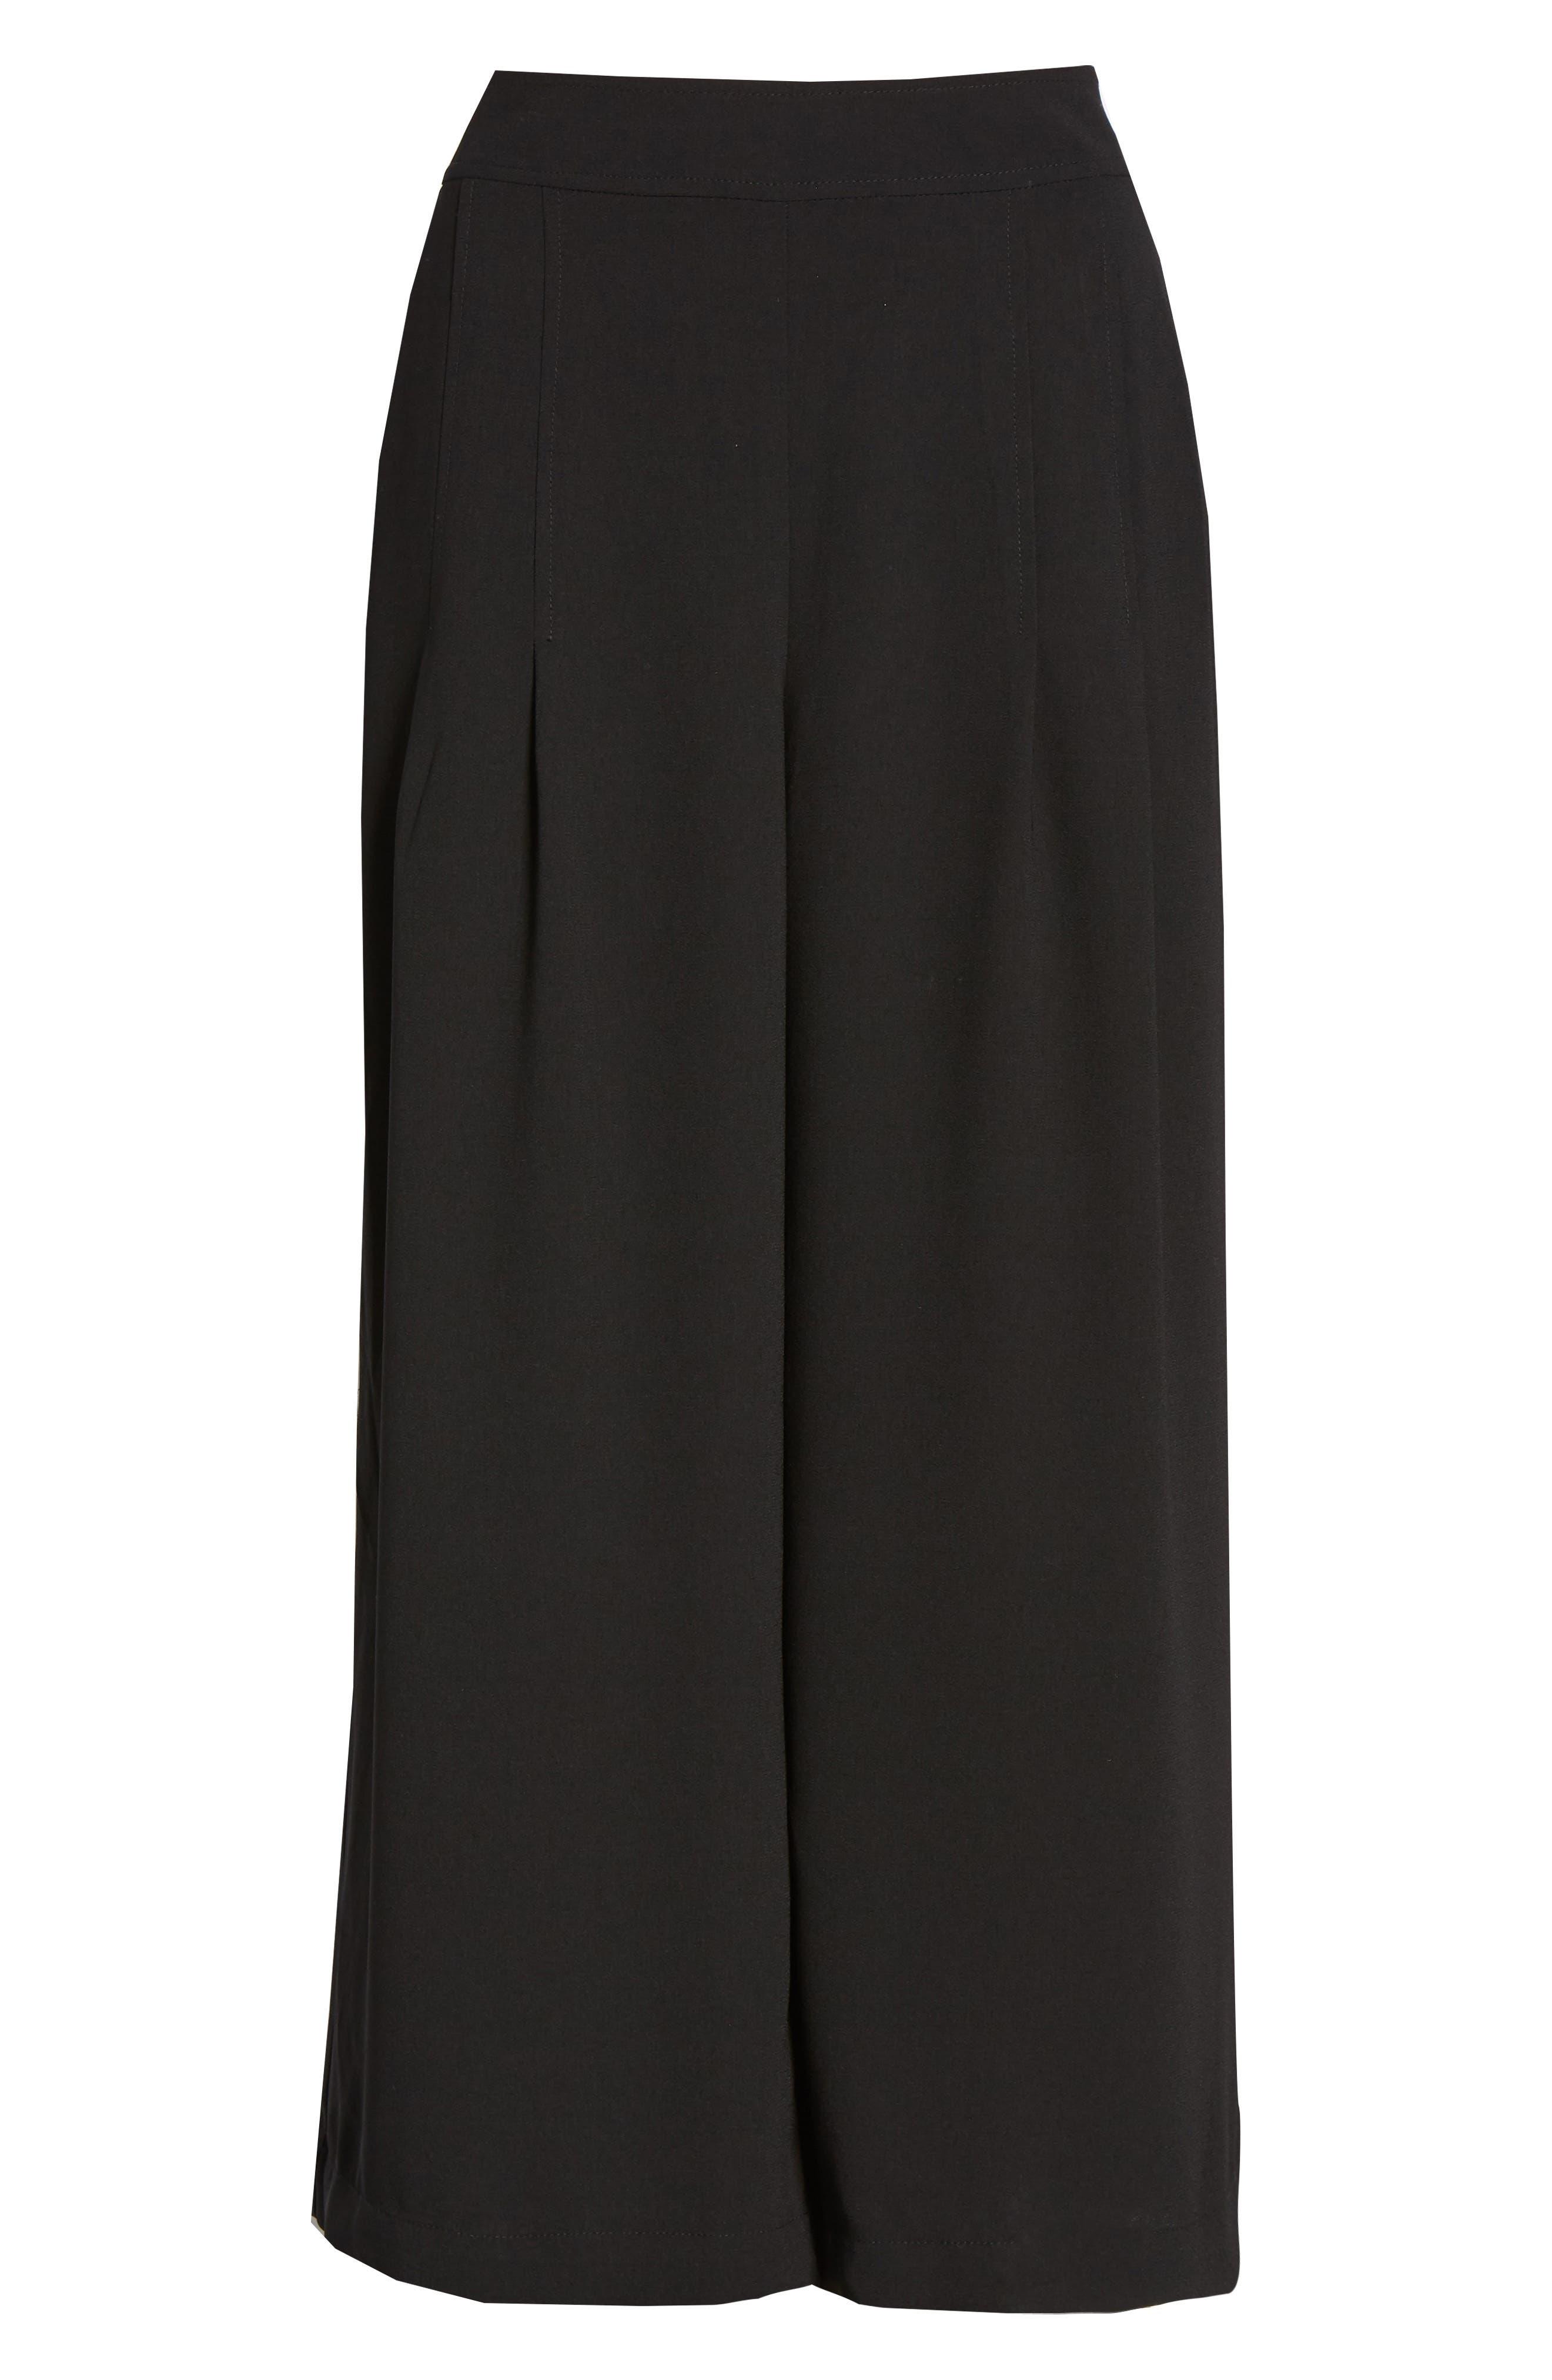 BP., High Waist Soft Wide Leg Crop Pants, Alternate thumbnail 8, color, BLACK